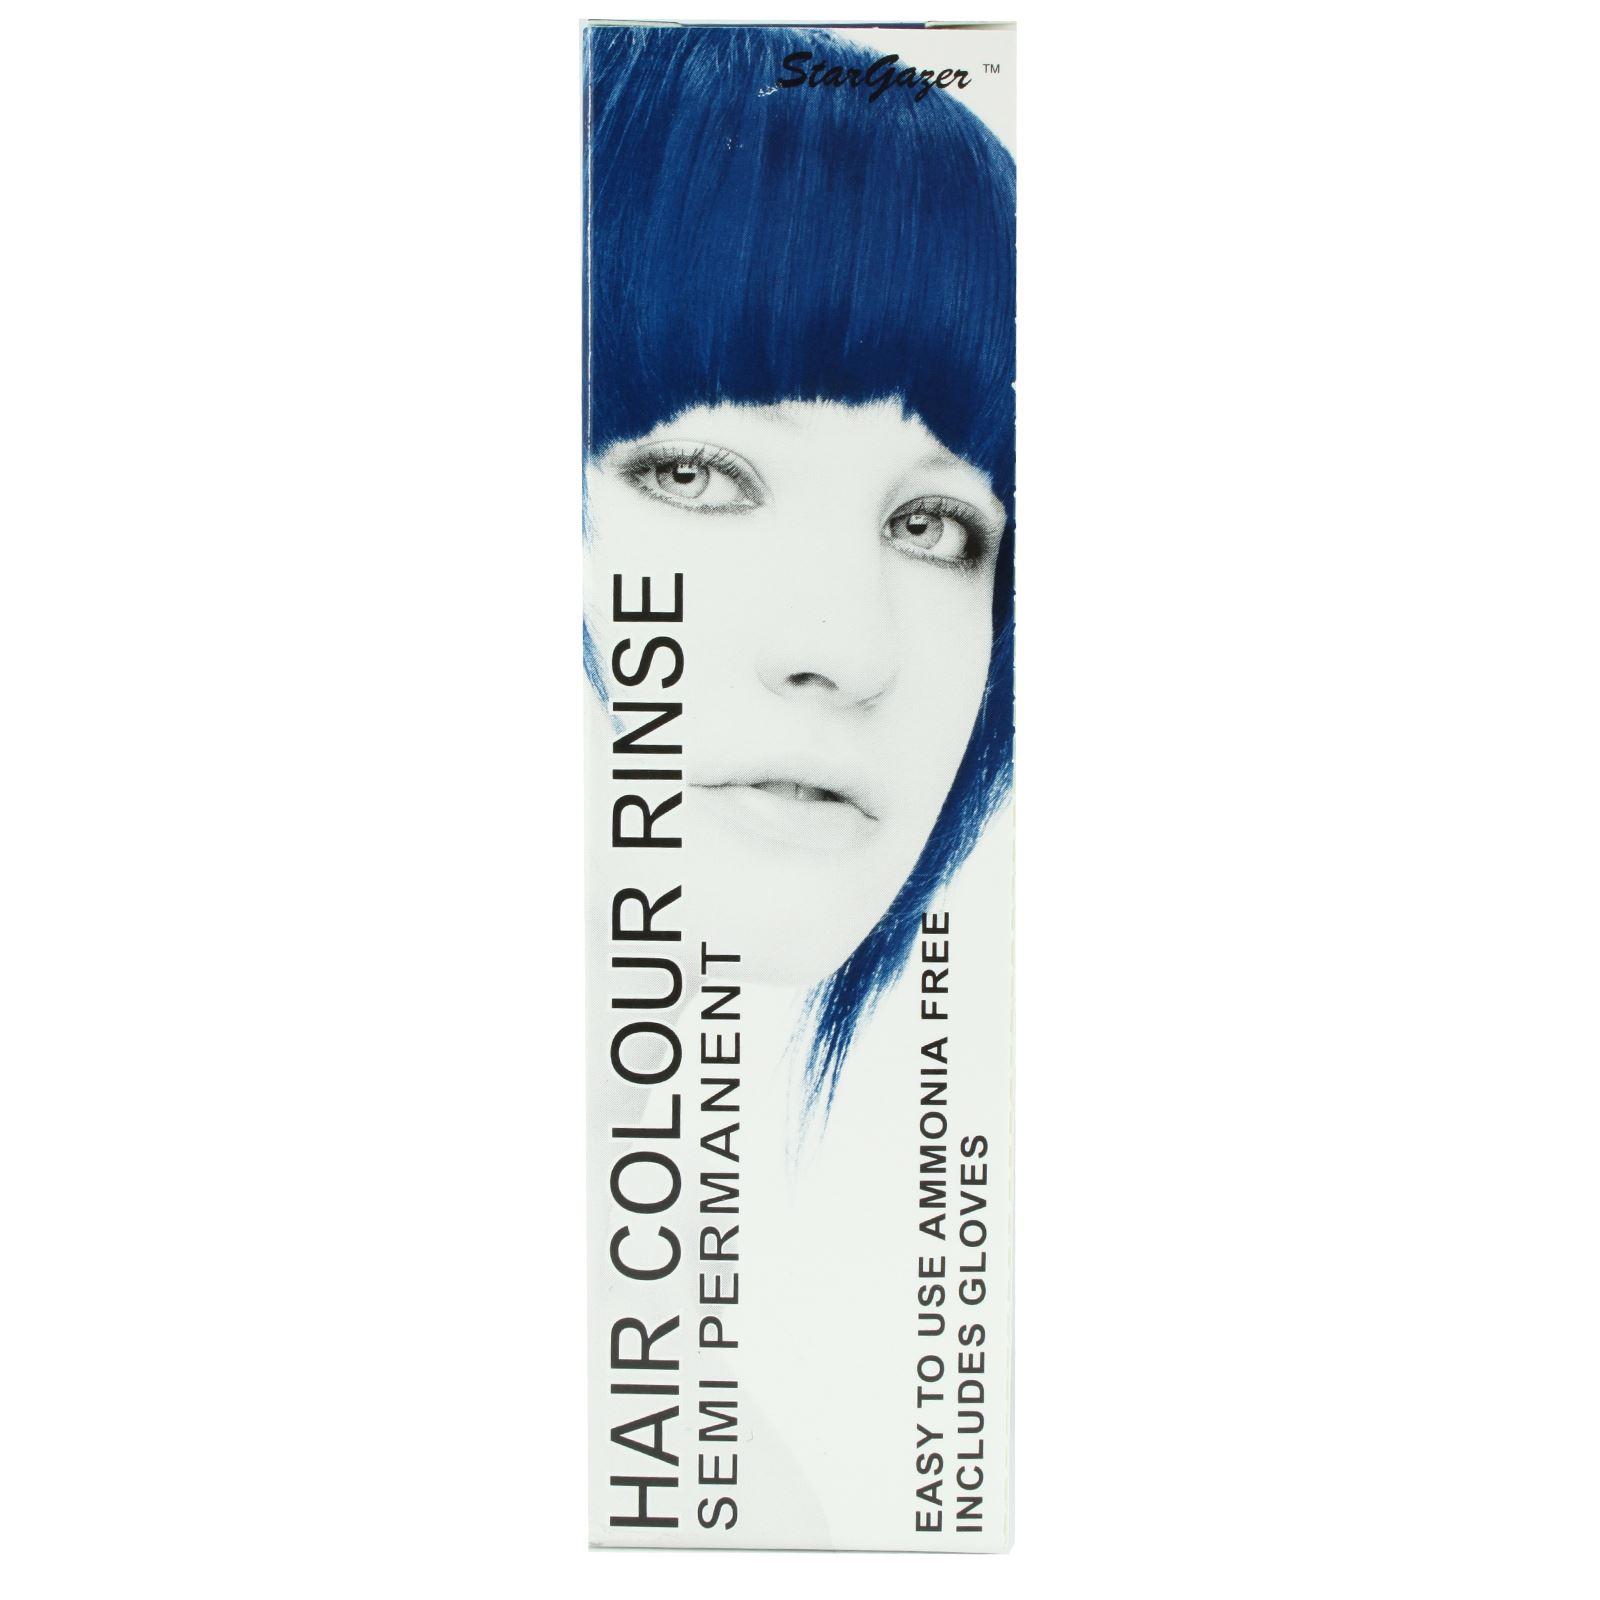 Stargazer Semi Permanent Hair Dye Cream Colour Rinse Tint Toner 1 2 Or 4 Pack